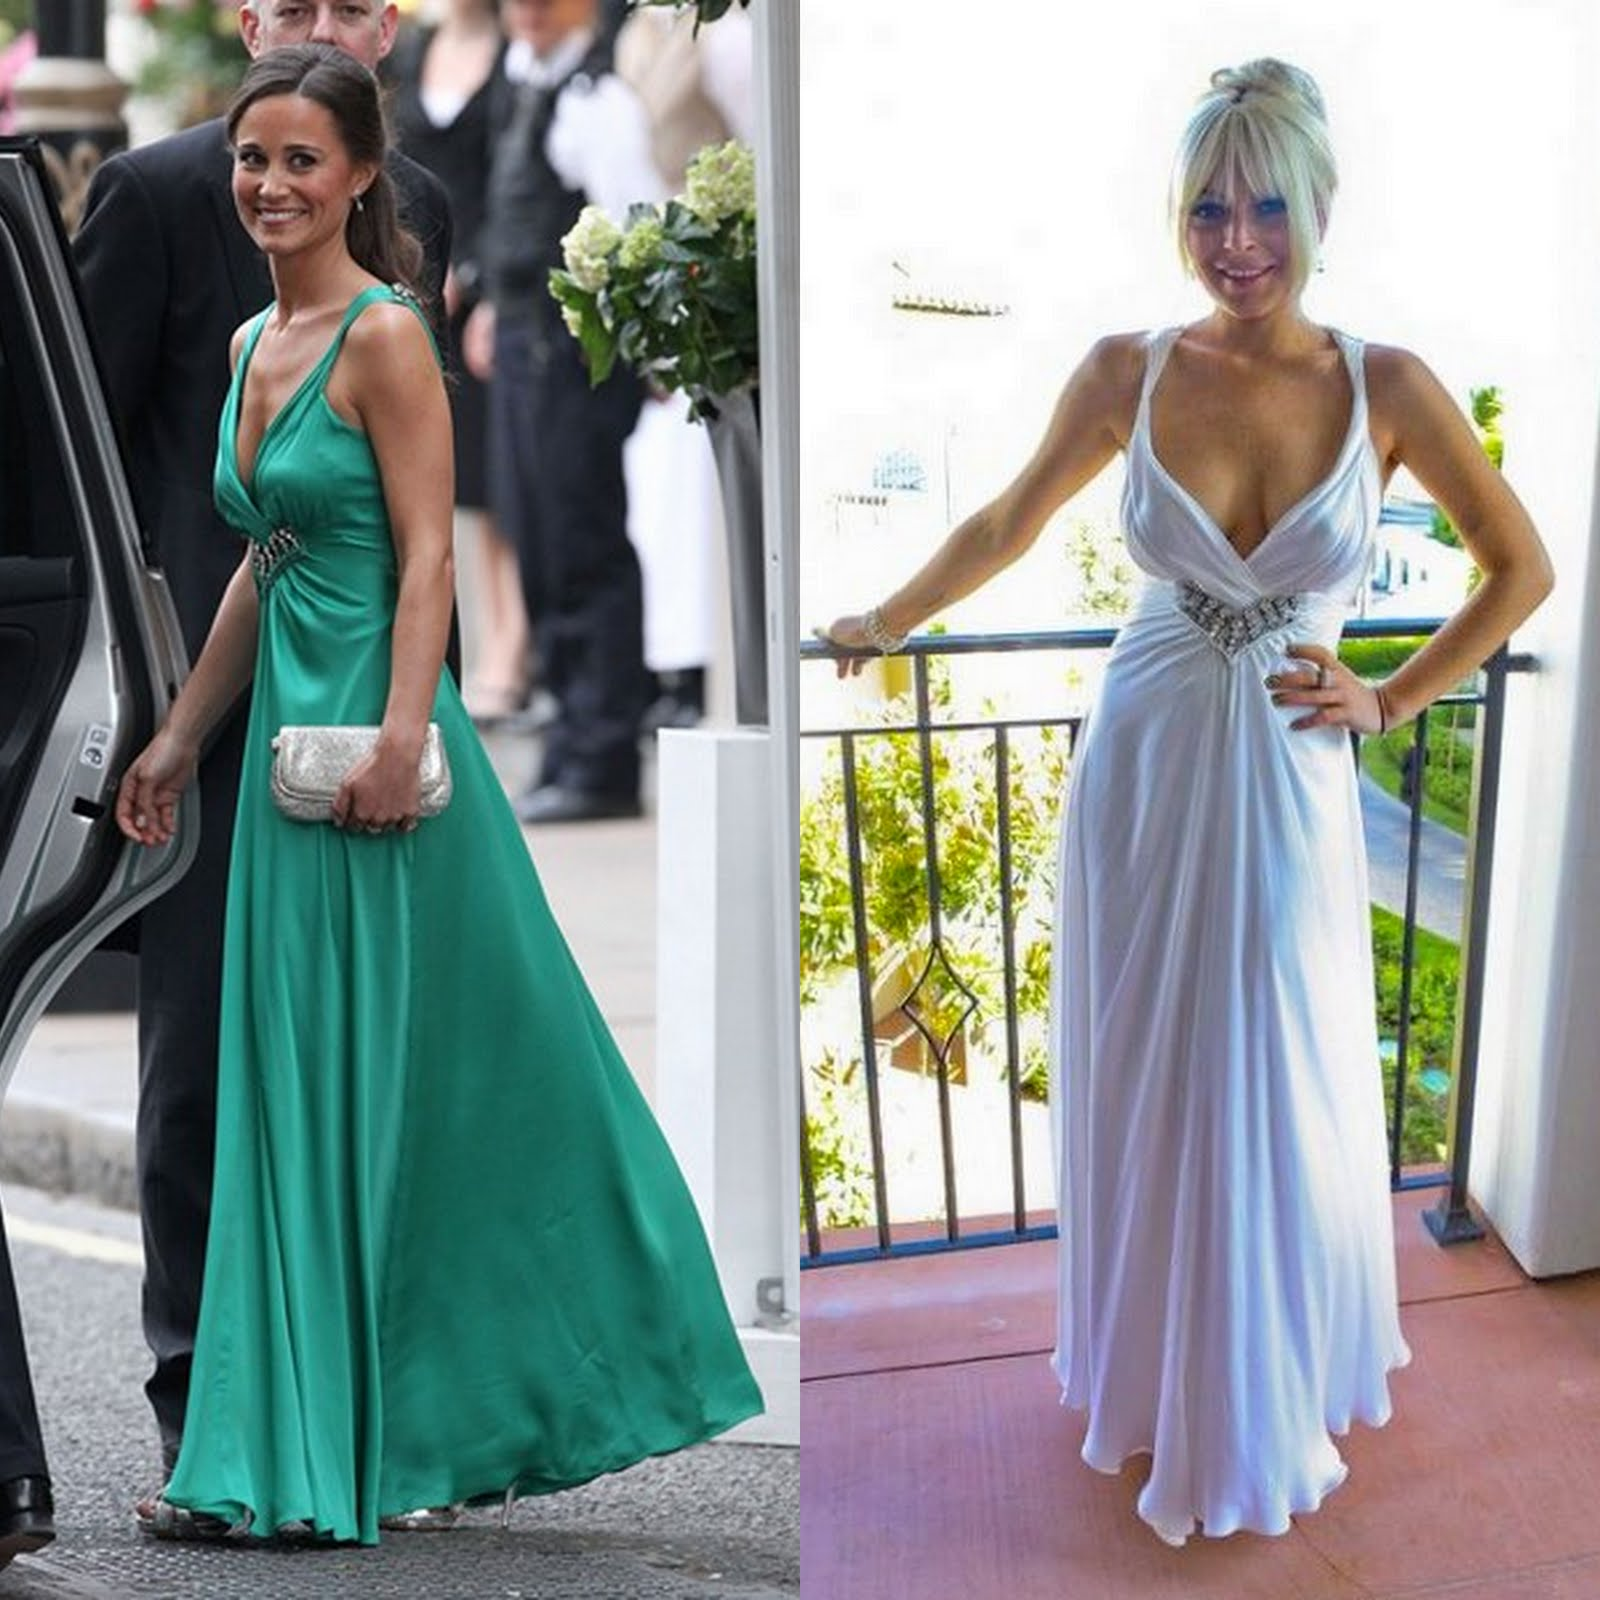 Pippa Middleton Wedding Reception Dress: Pippa Middleton Green Evening Dress